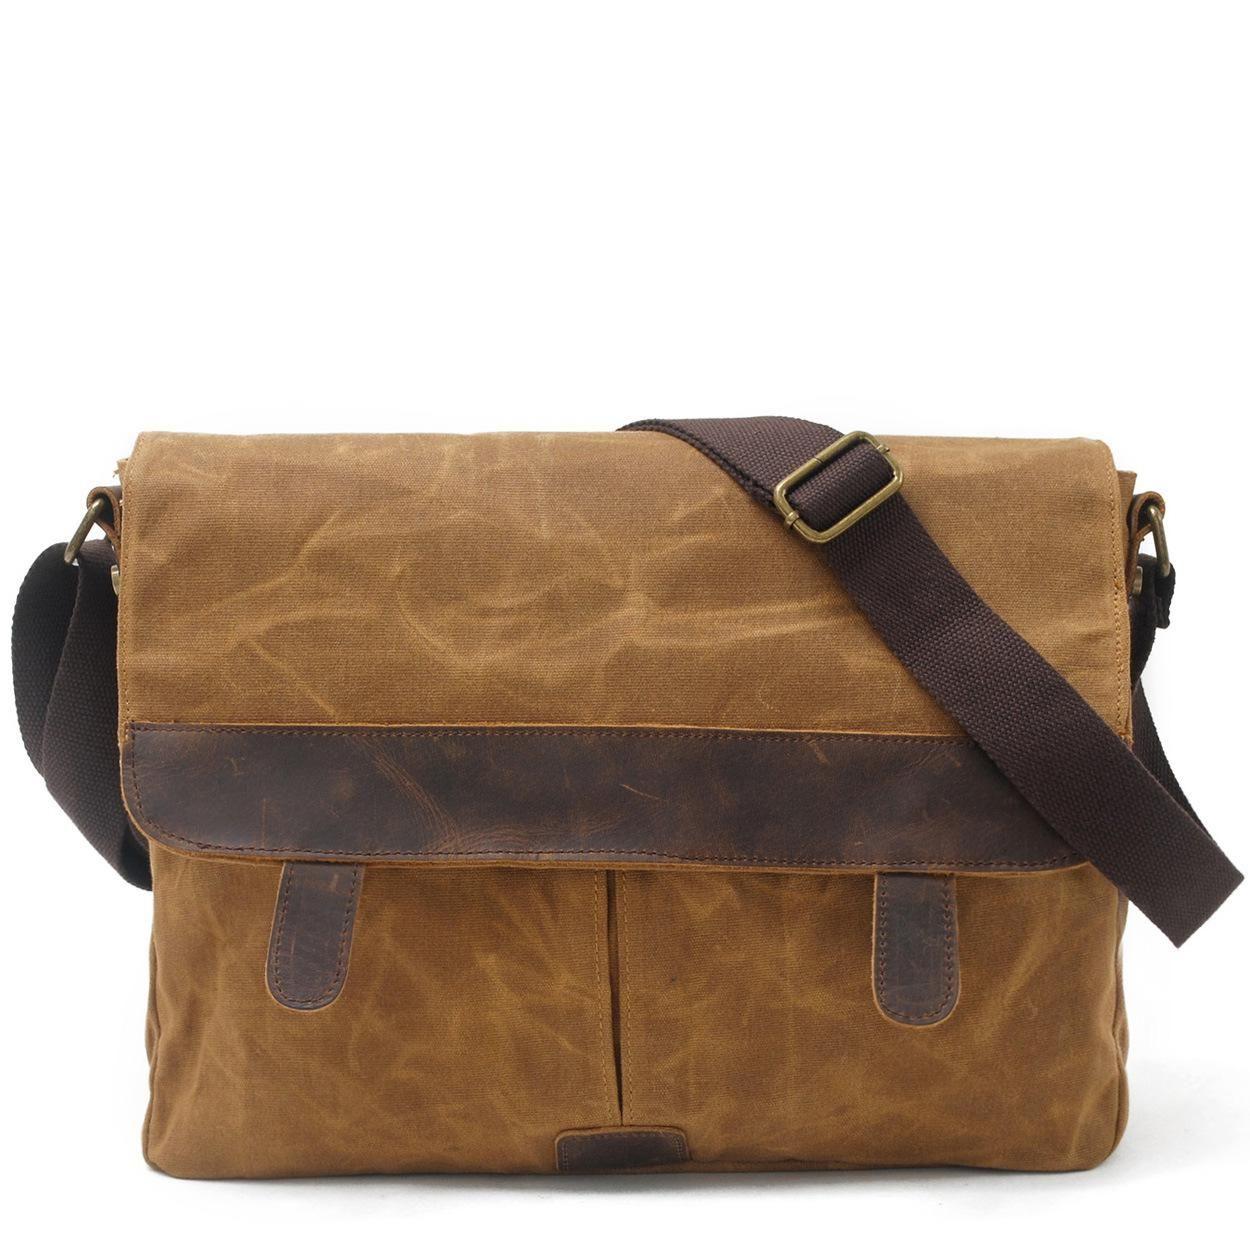 16600f64b5 Crazy Horse Genuine Leather Canvas Men Messenger Bag Casual Crossbody  Shoulder Bag Waterproof Vintage Male Travel Bags Fashion Messenger Bags For  Women ...